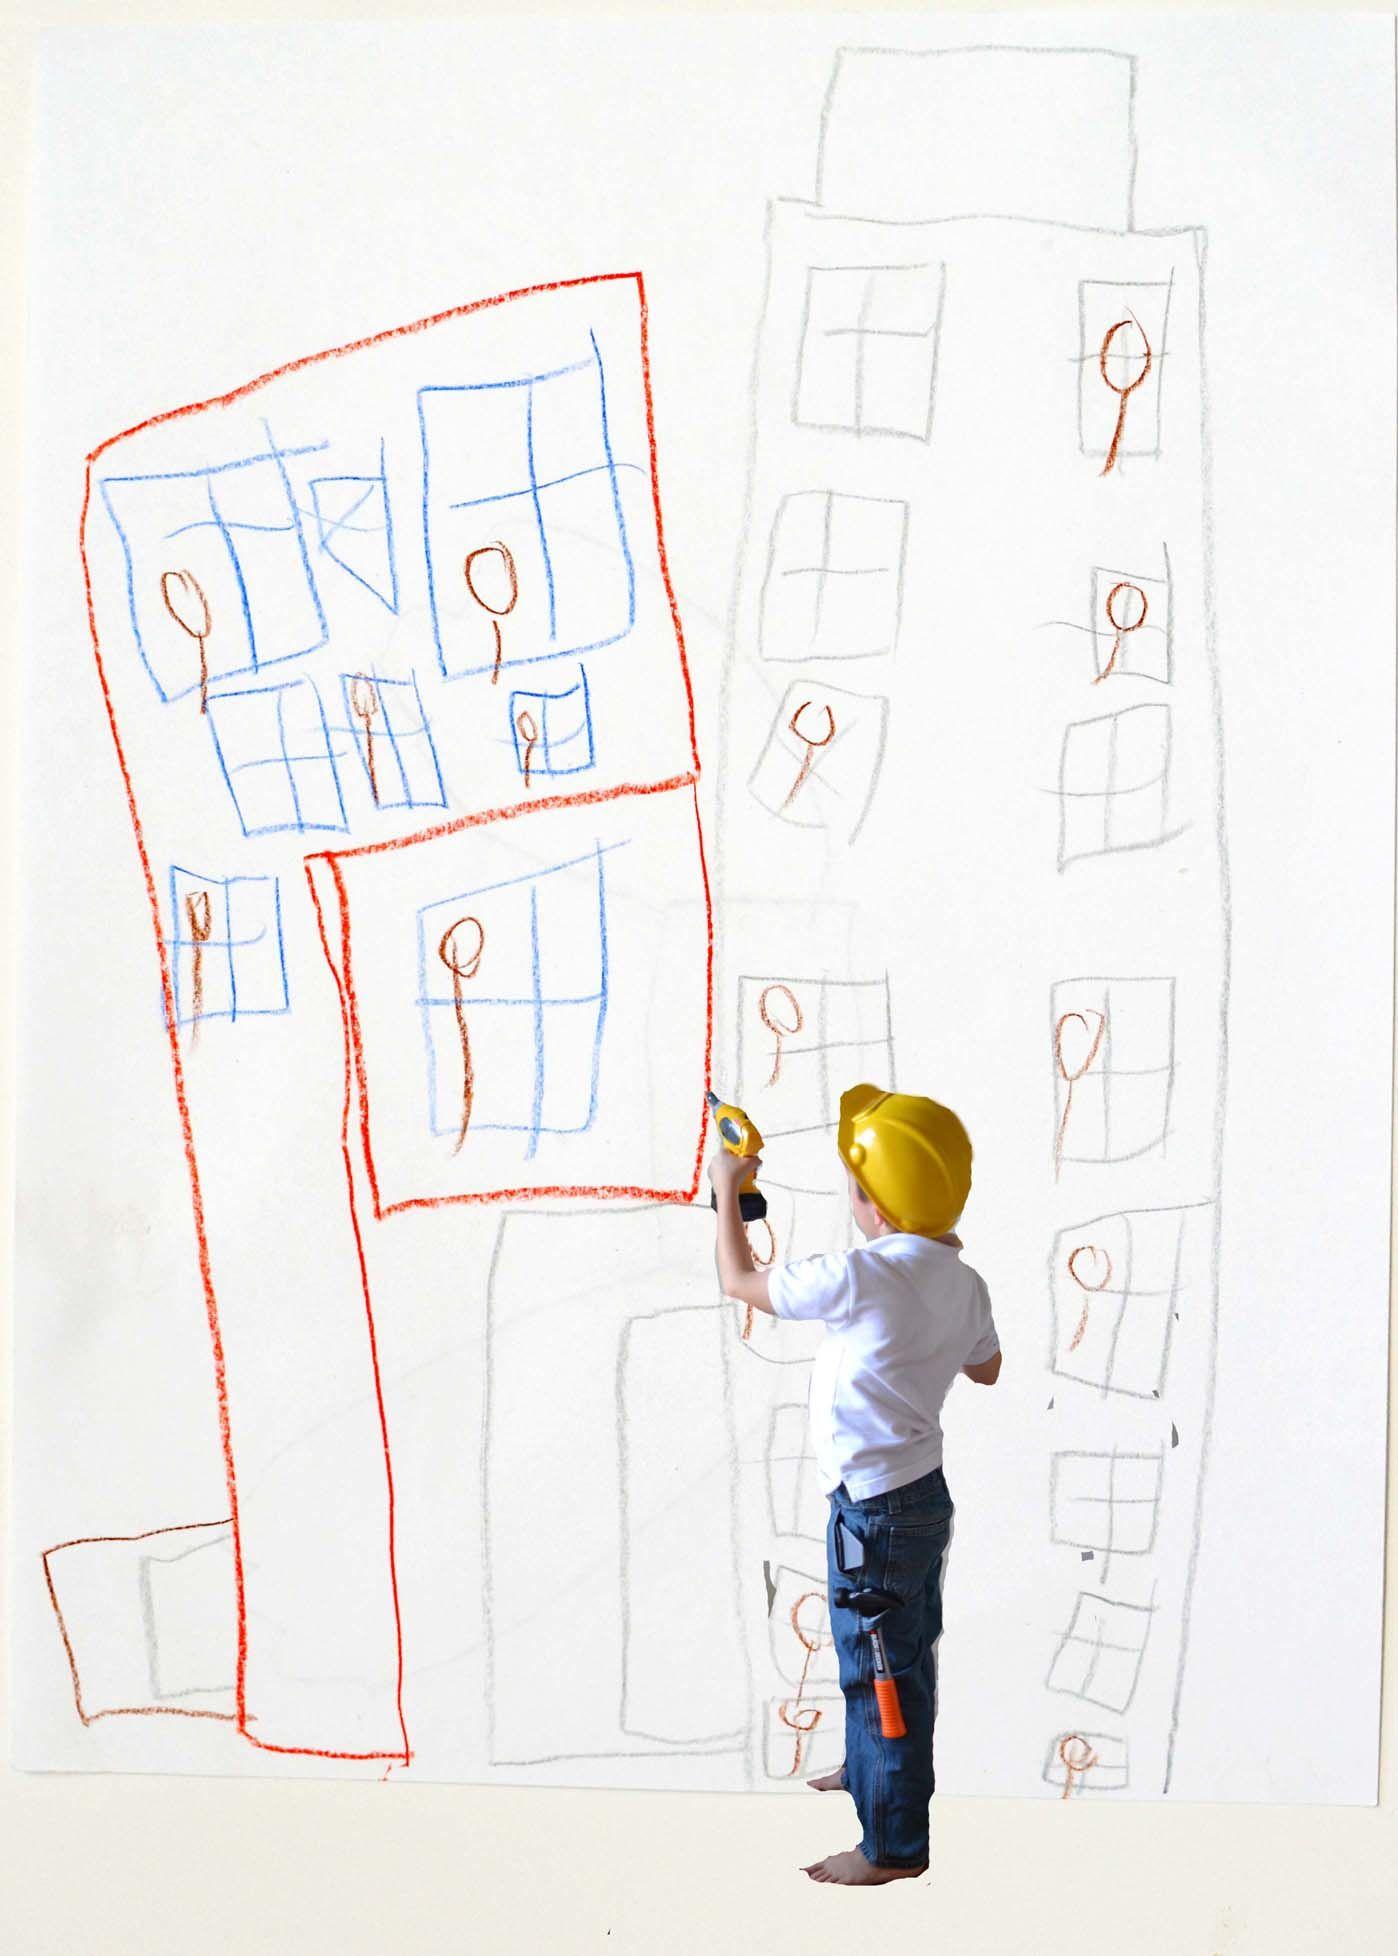 Project activities in pre-school. Technology project activities in pre-school 48